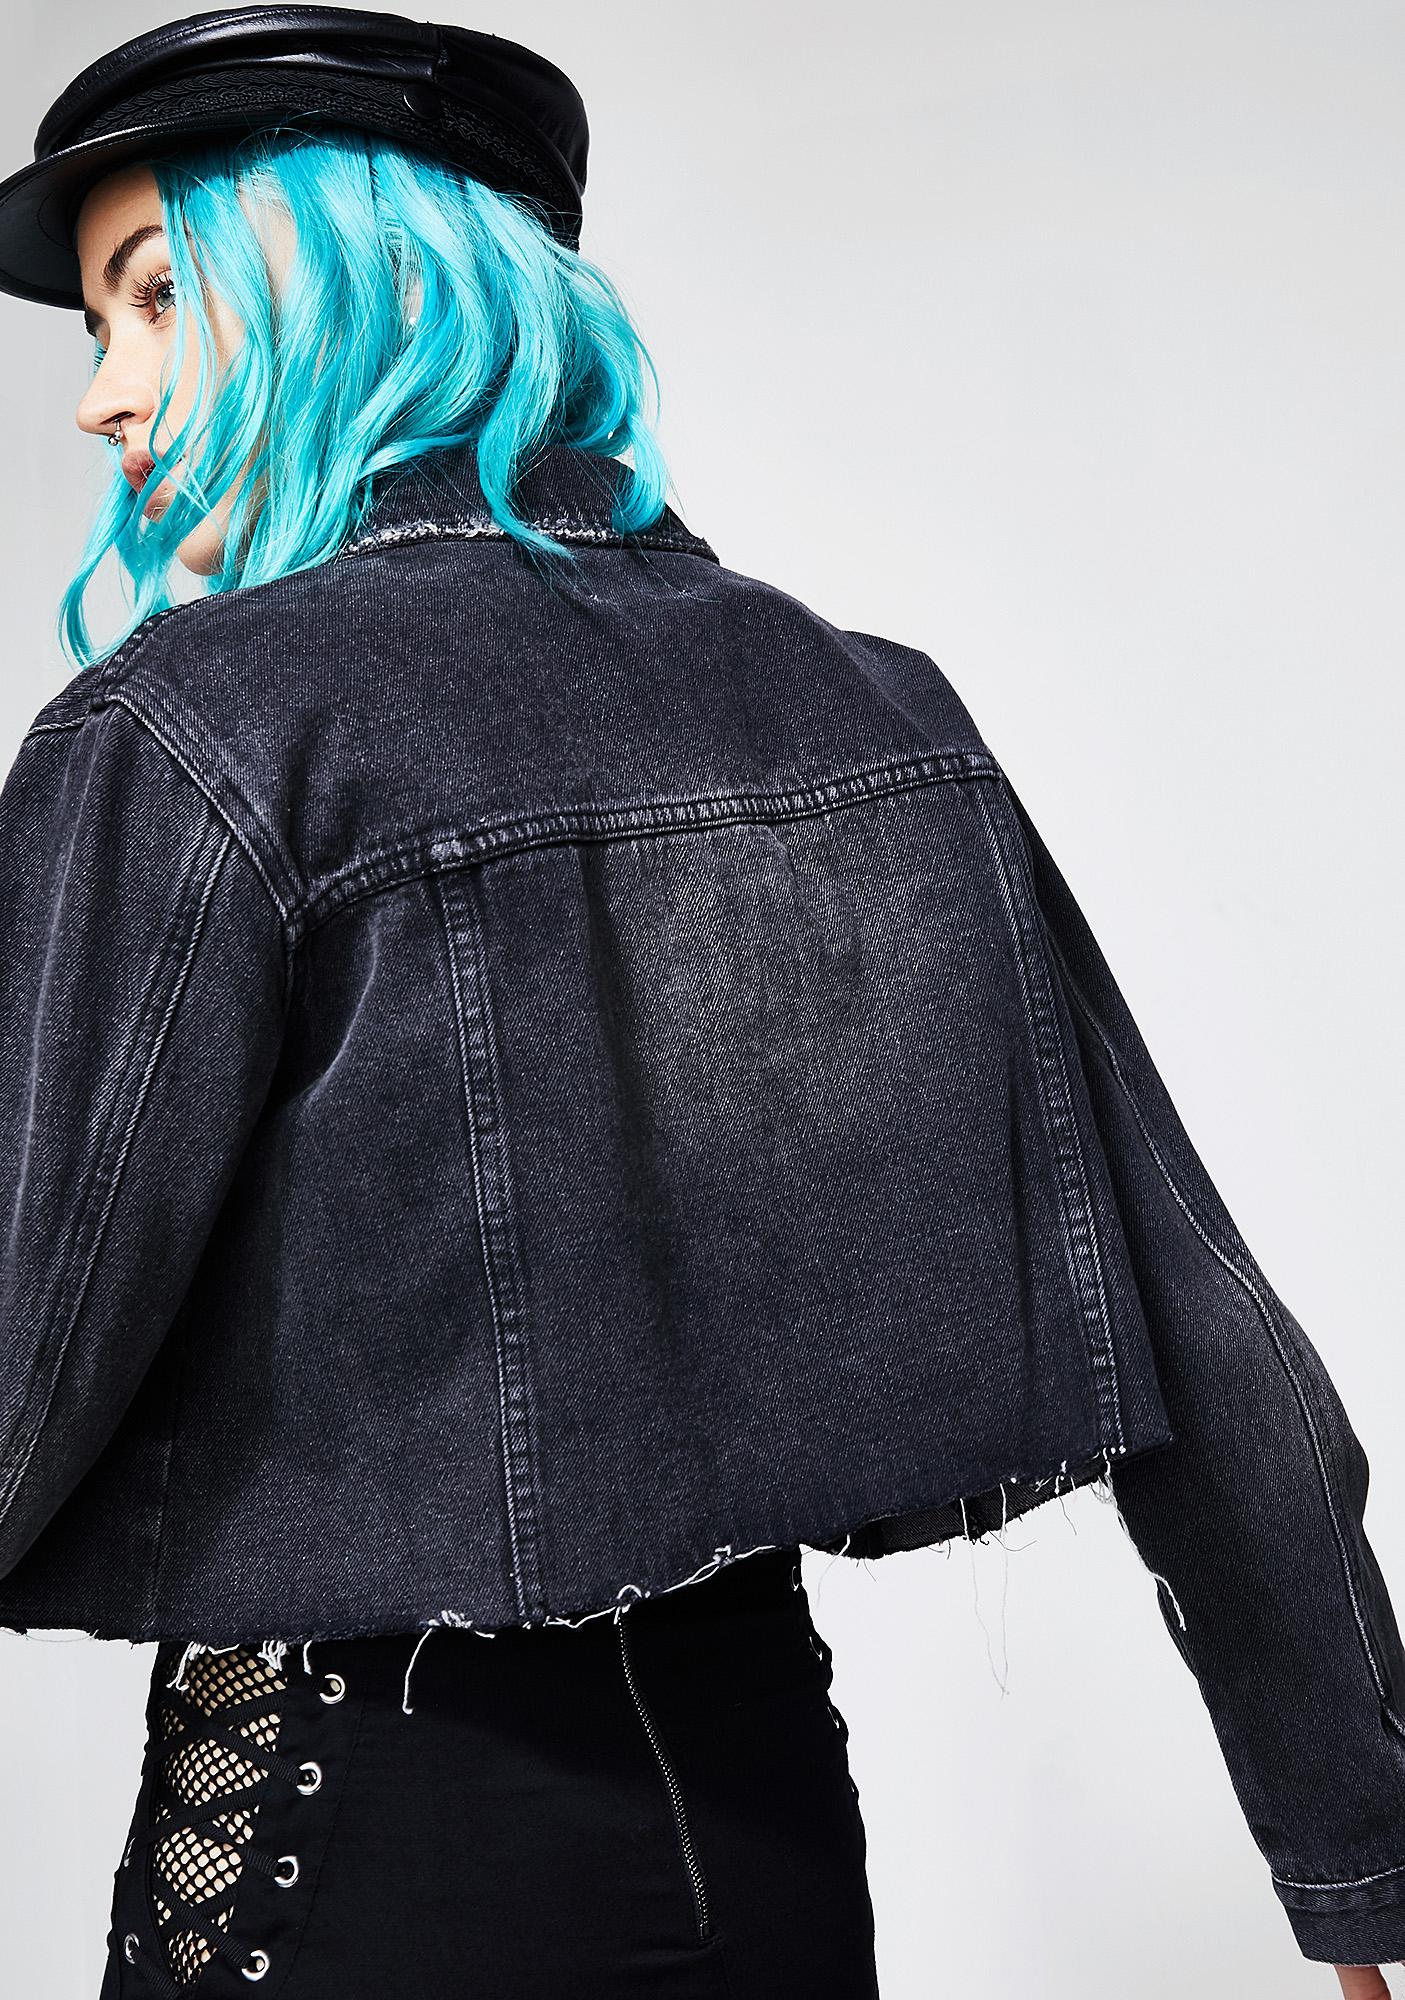 Twiin Overcast Cut-Off Denim Jacket